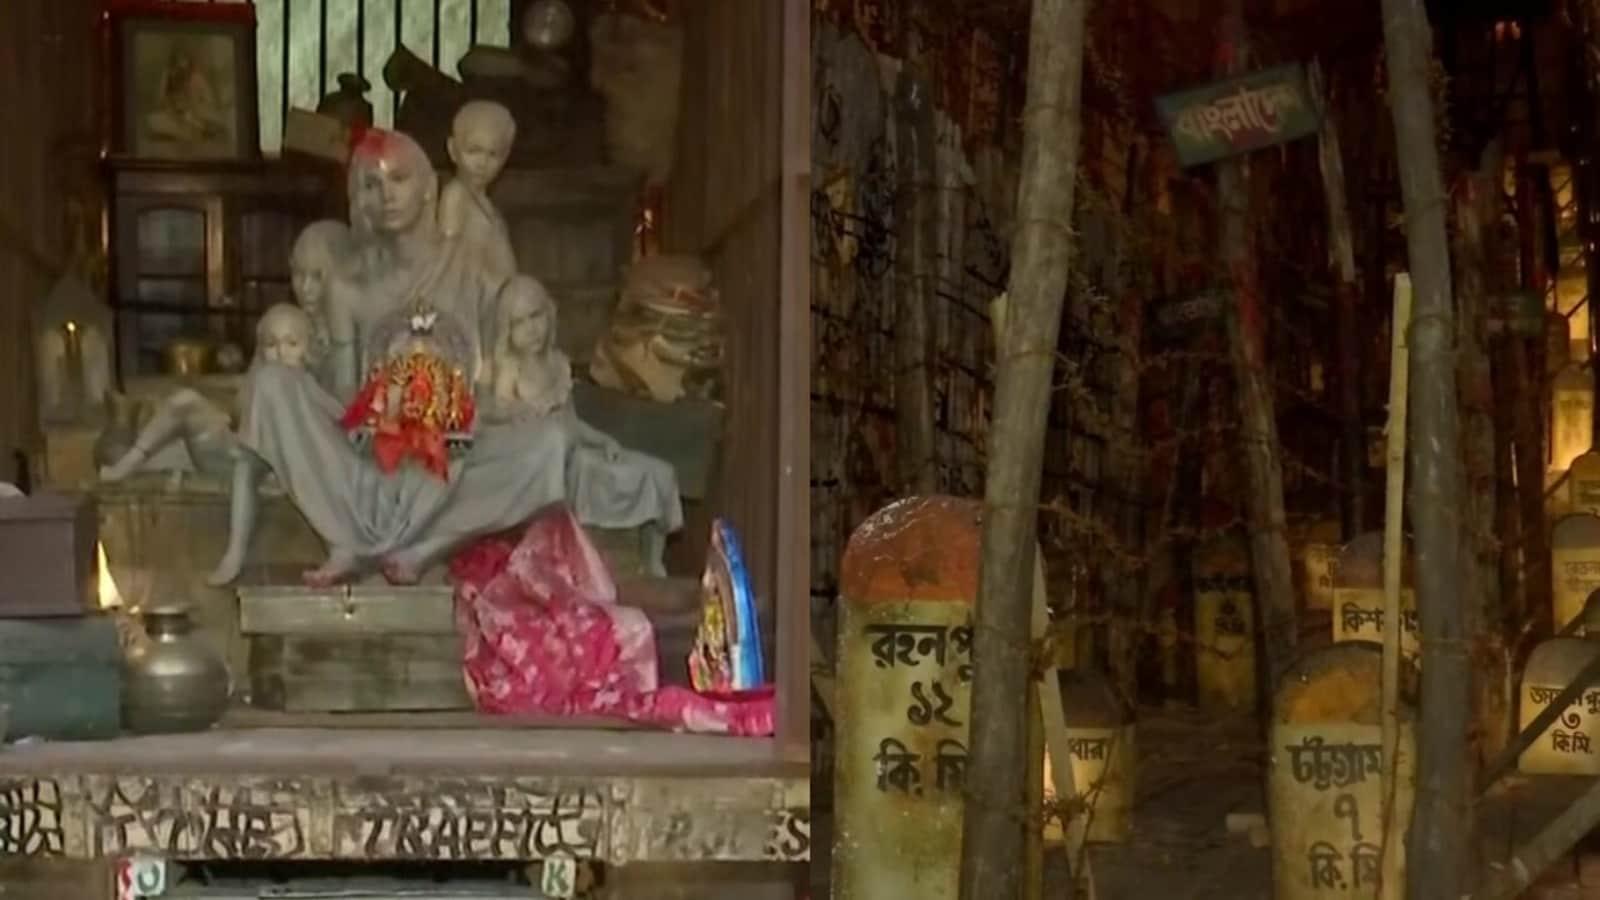 Durga Puja is political in Kolkata: NRC, migrant hardship theme for Behala's Barisha Club